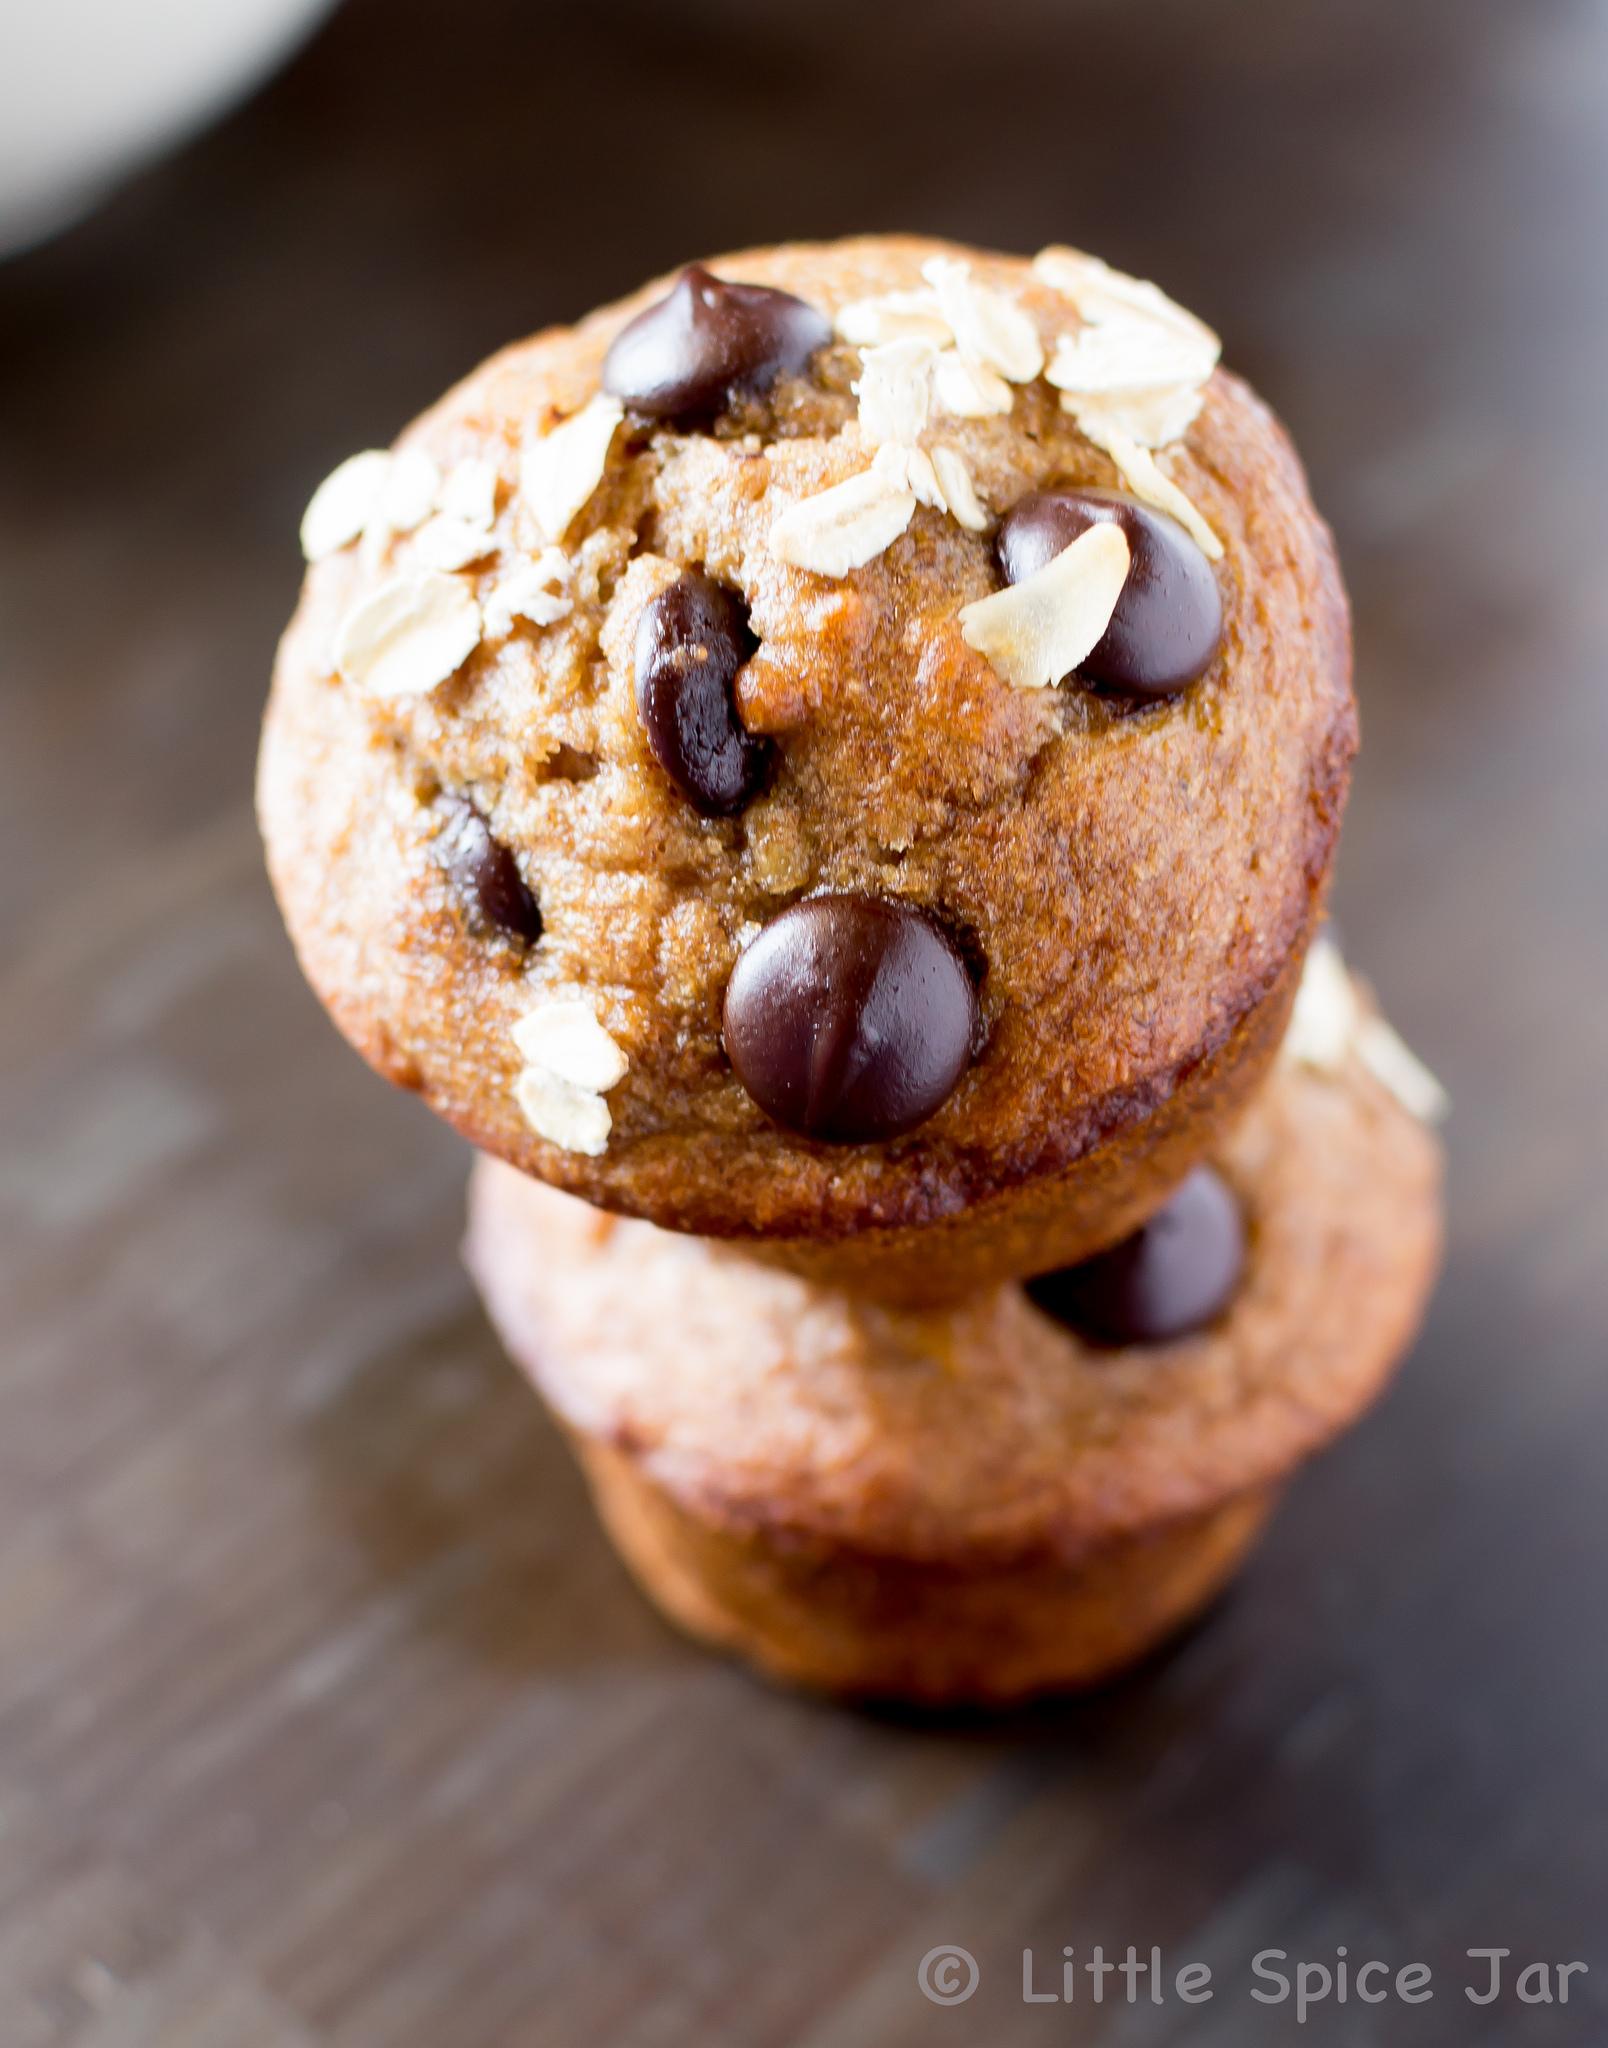 HEALTHY CHOCOLATE CHIP BANANA MUFFINS | Little Spice Jar